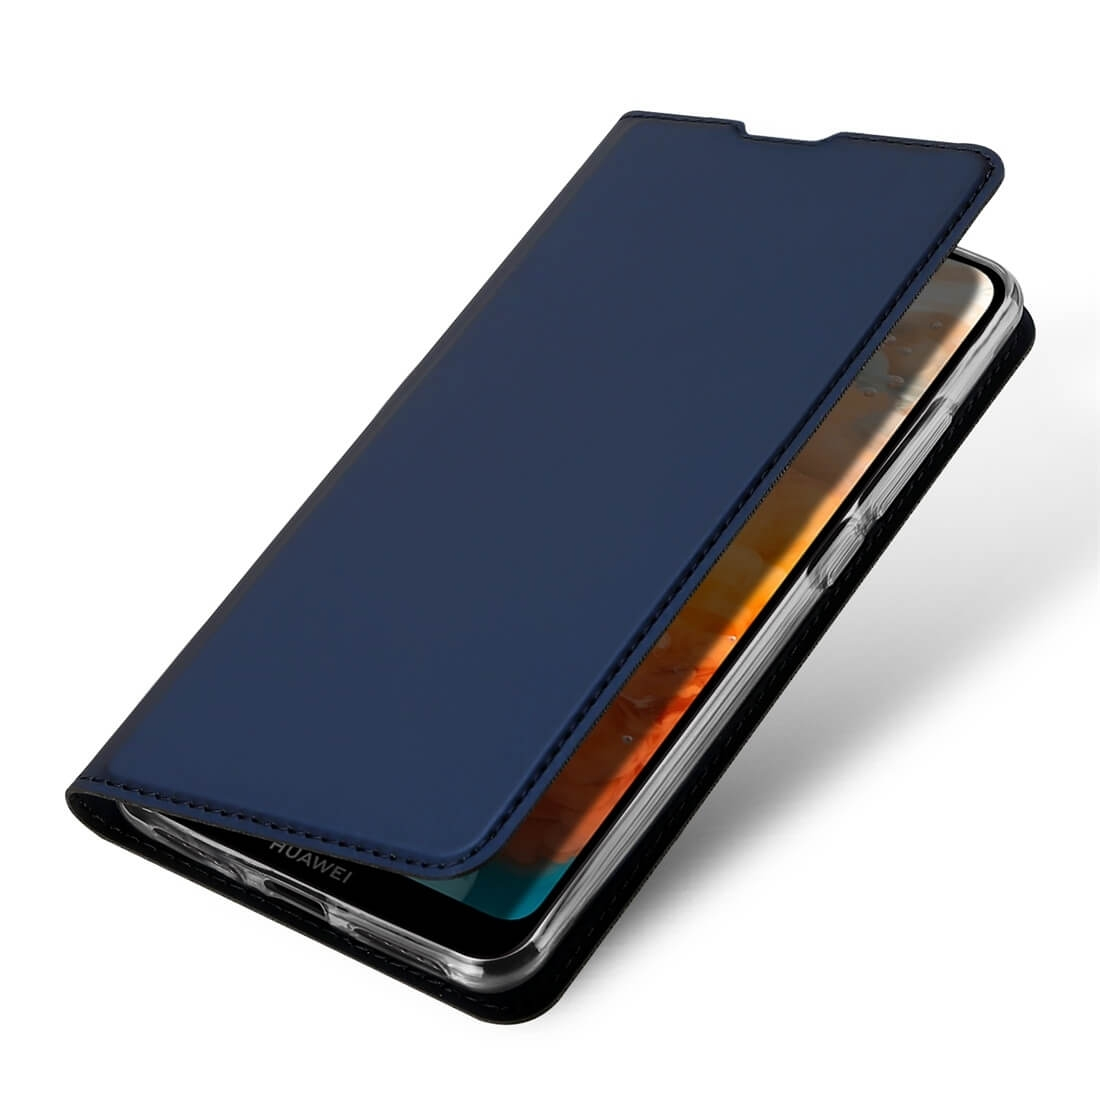 DUX Peňaženkový obal Huawei Y6 2019 modrý